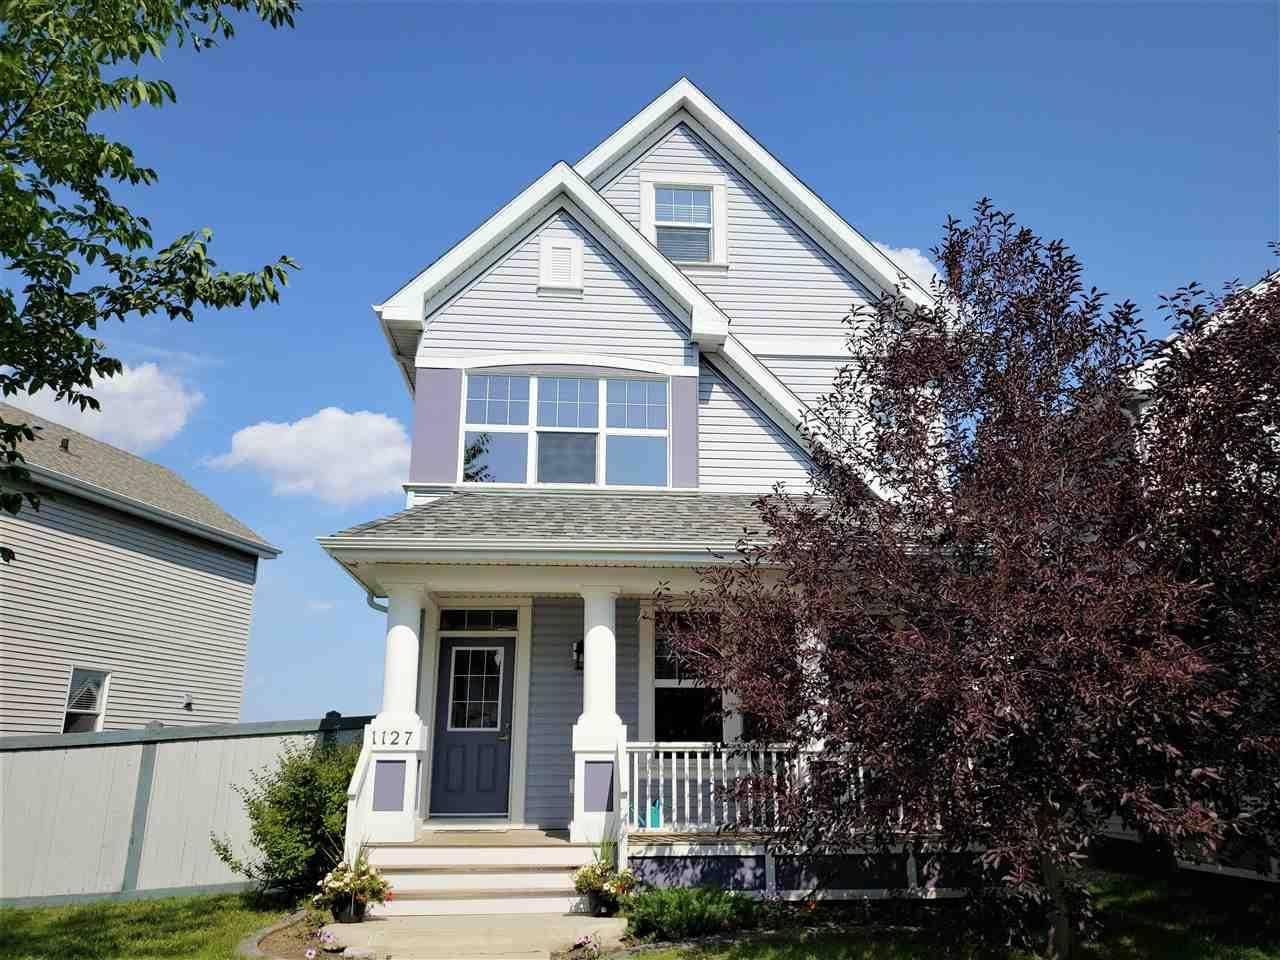 House for sale at 1127 74 St Sw Edmonton Alberta - MLS: E4169069